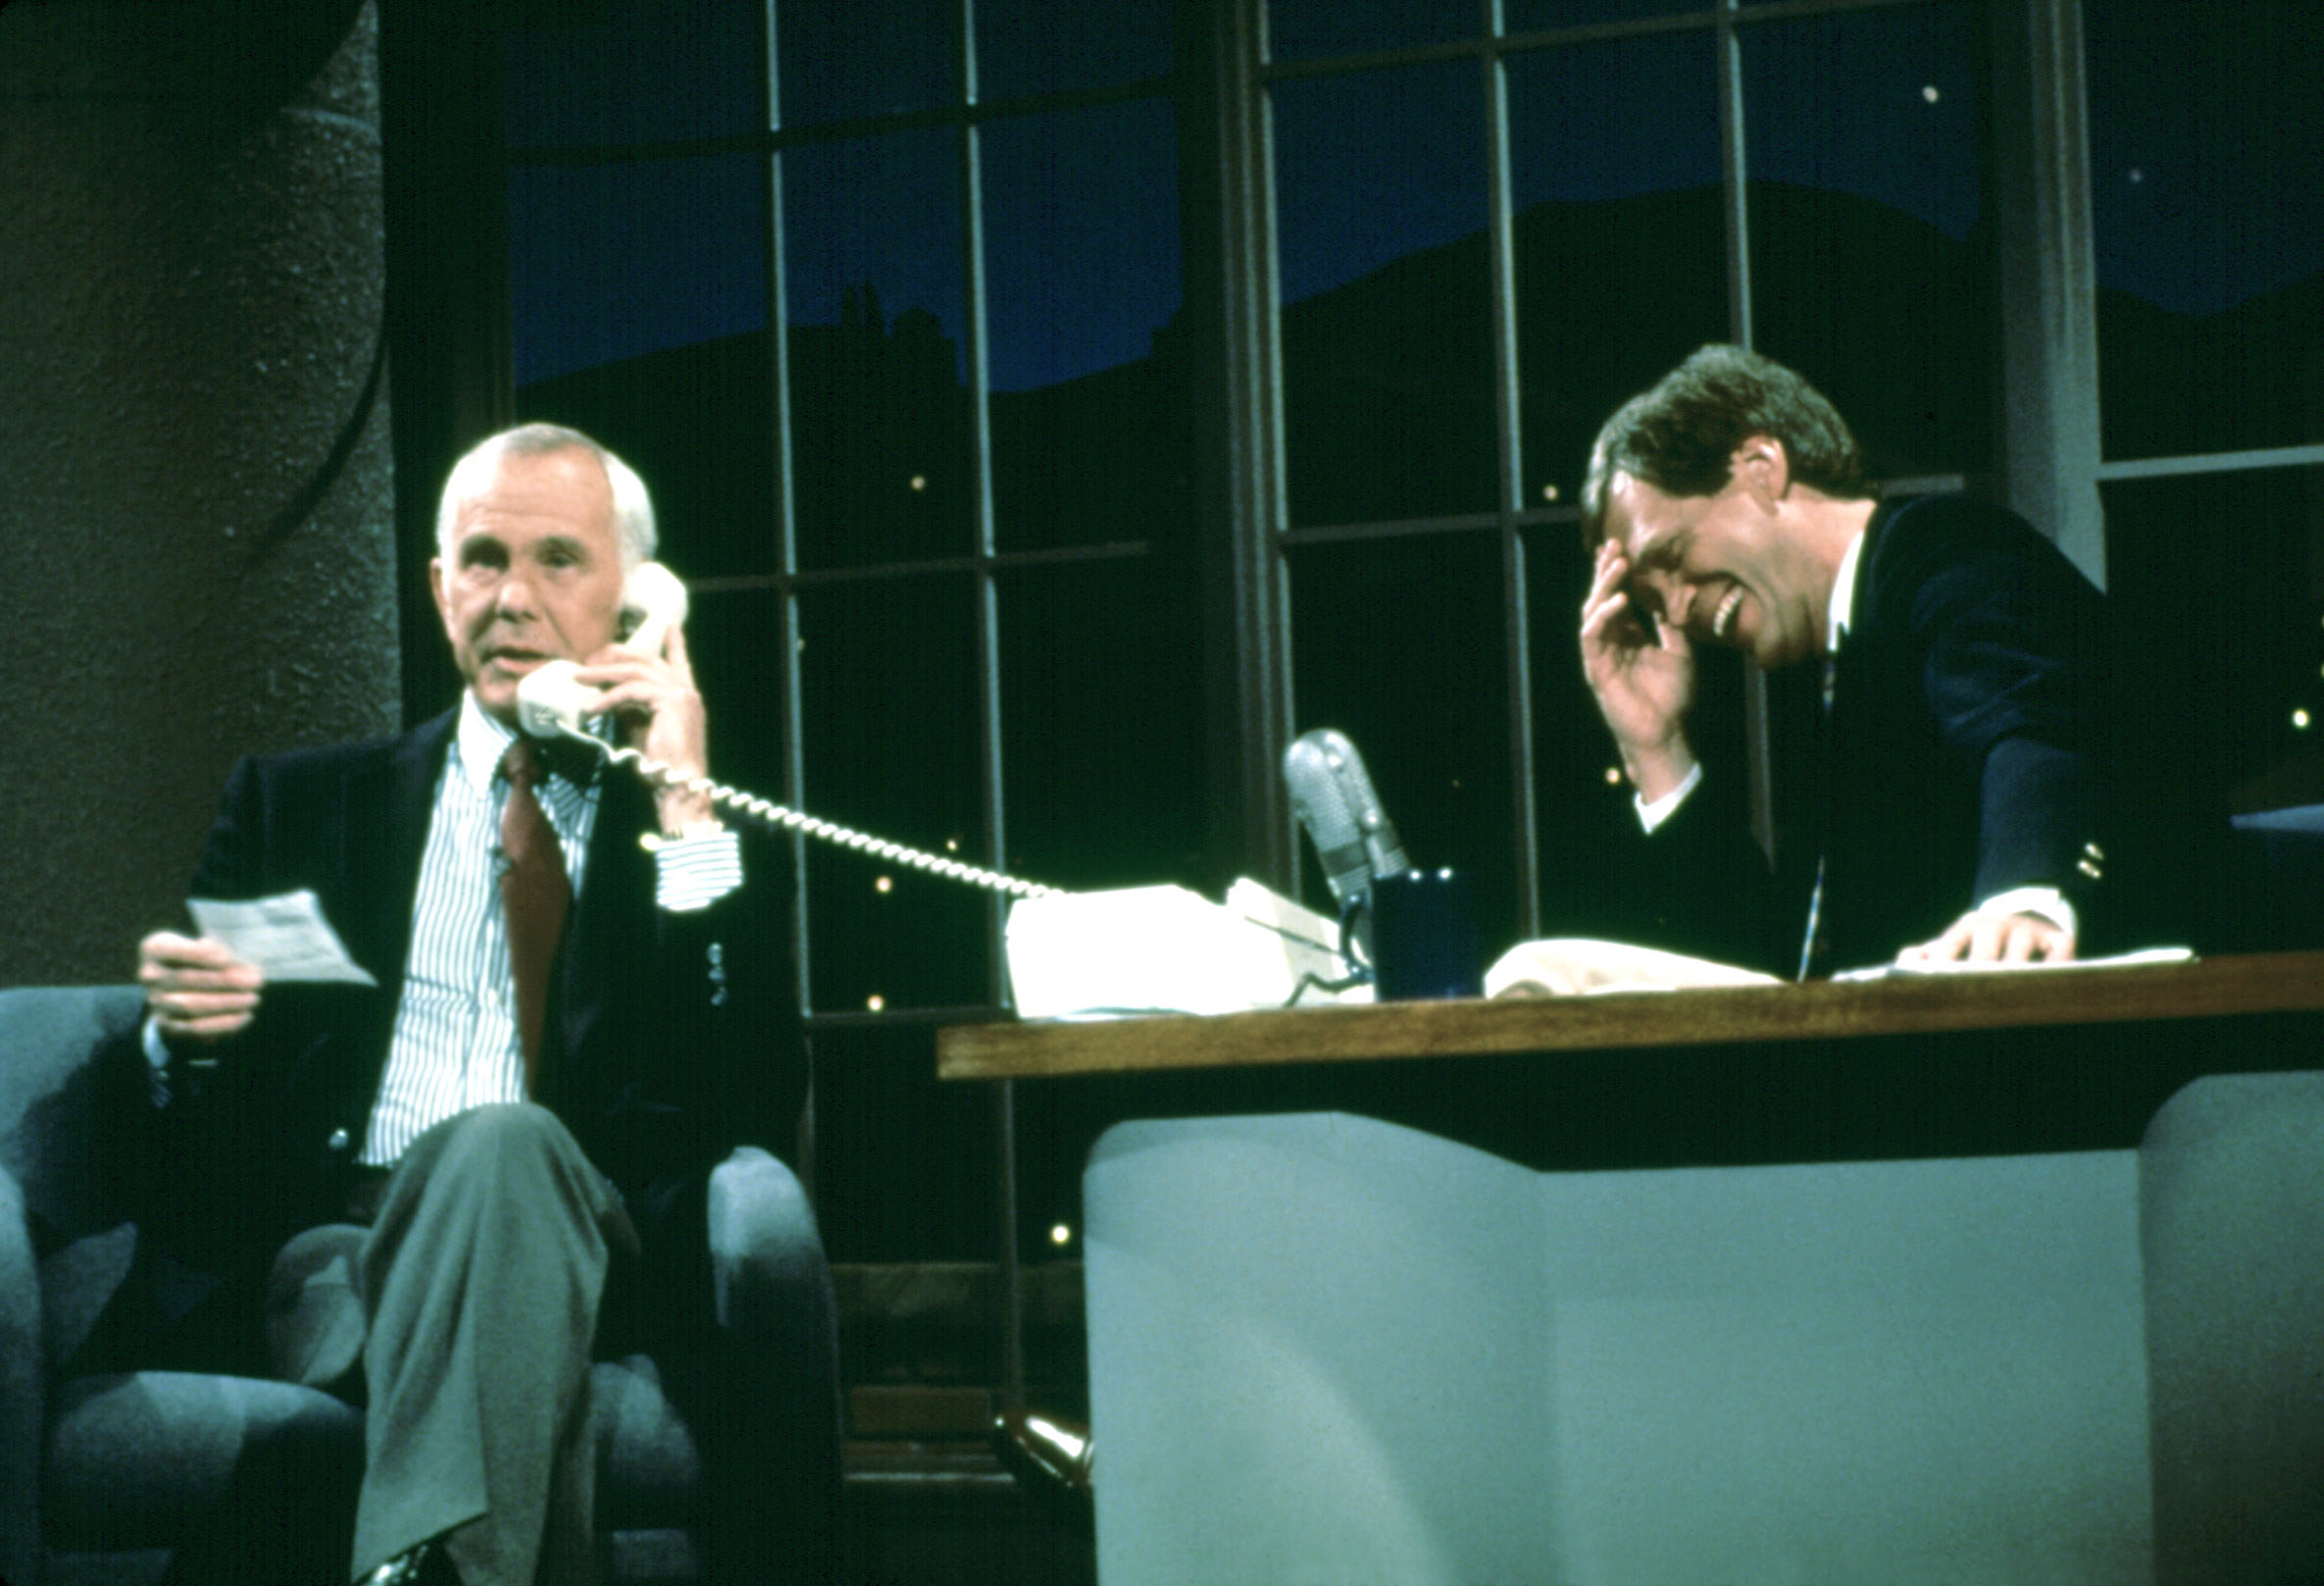 Carson on Letterman